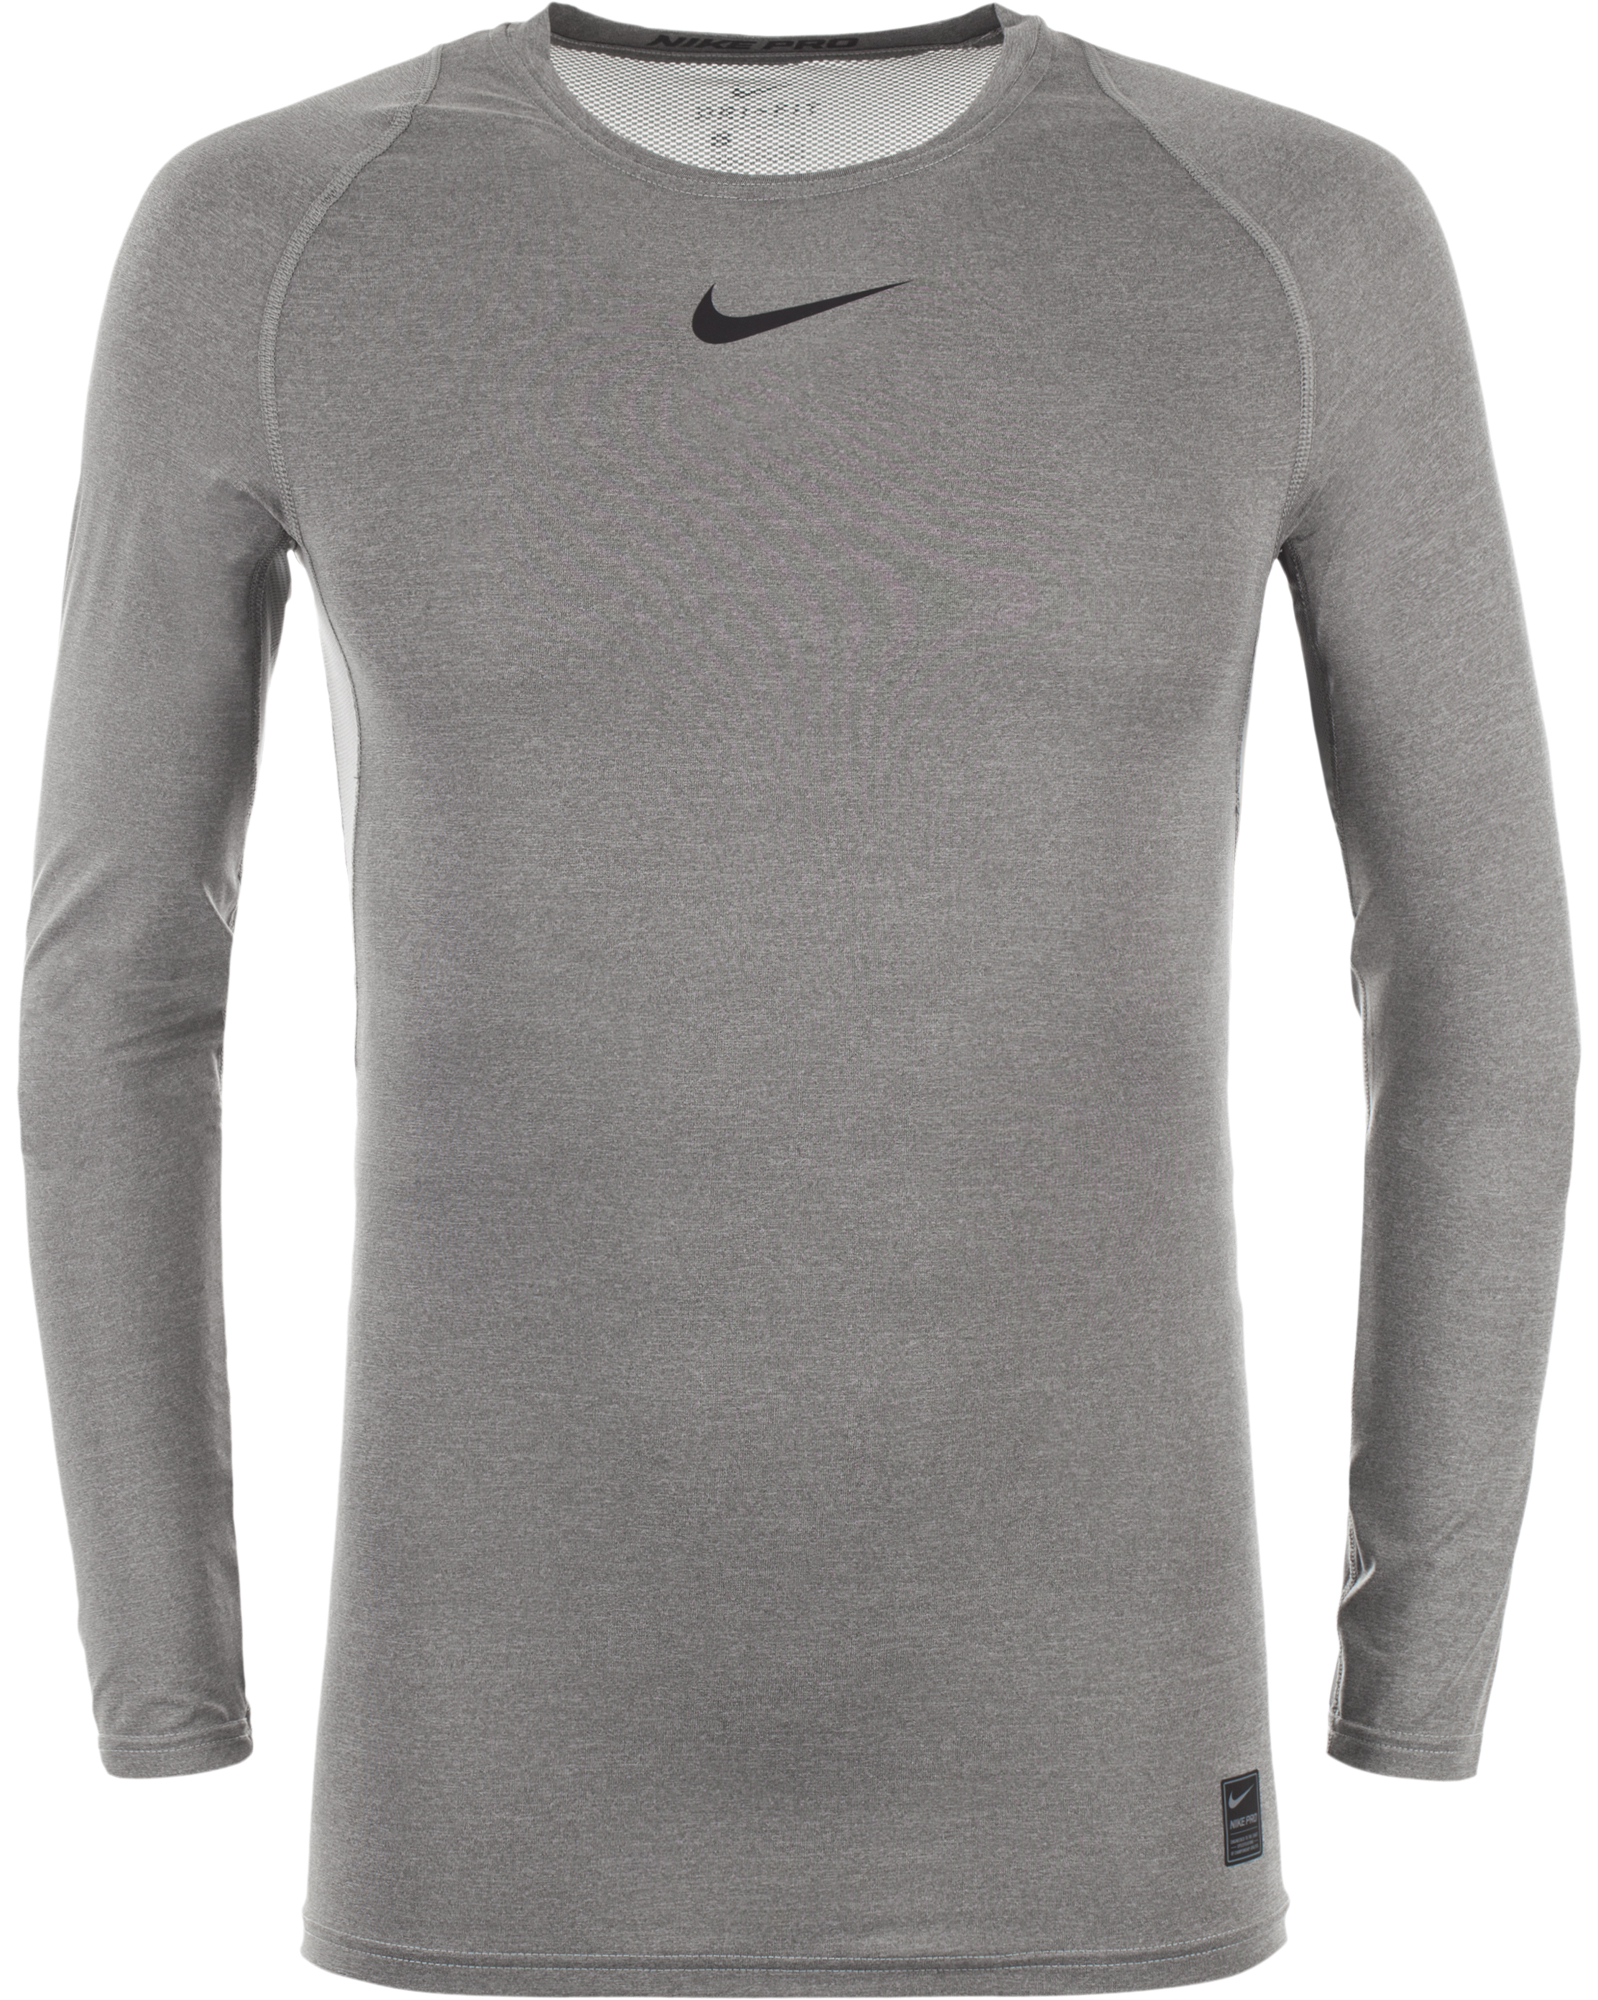 Nike Футболка с длинным рукавом мужская Nike Pro, размер 52-54 цена